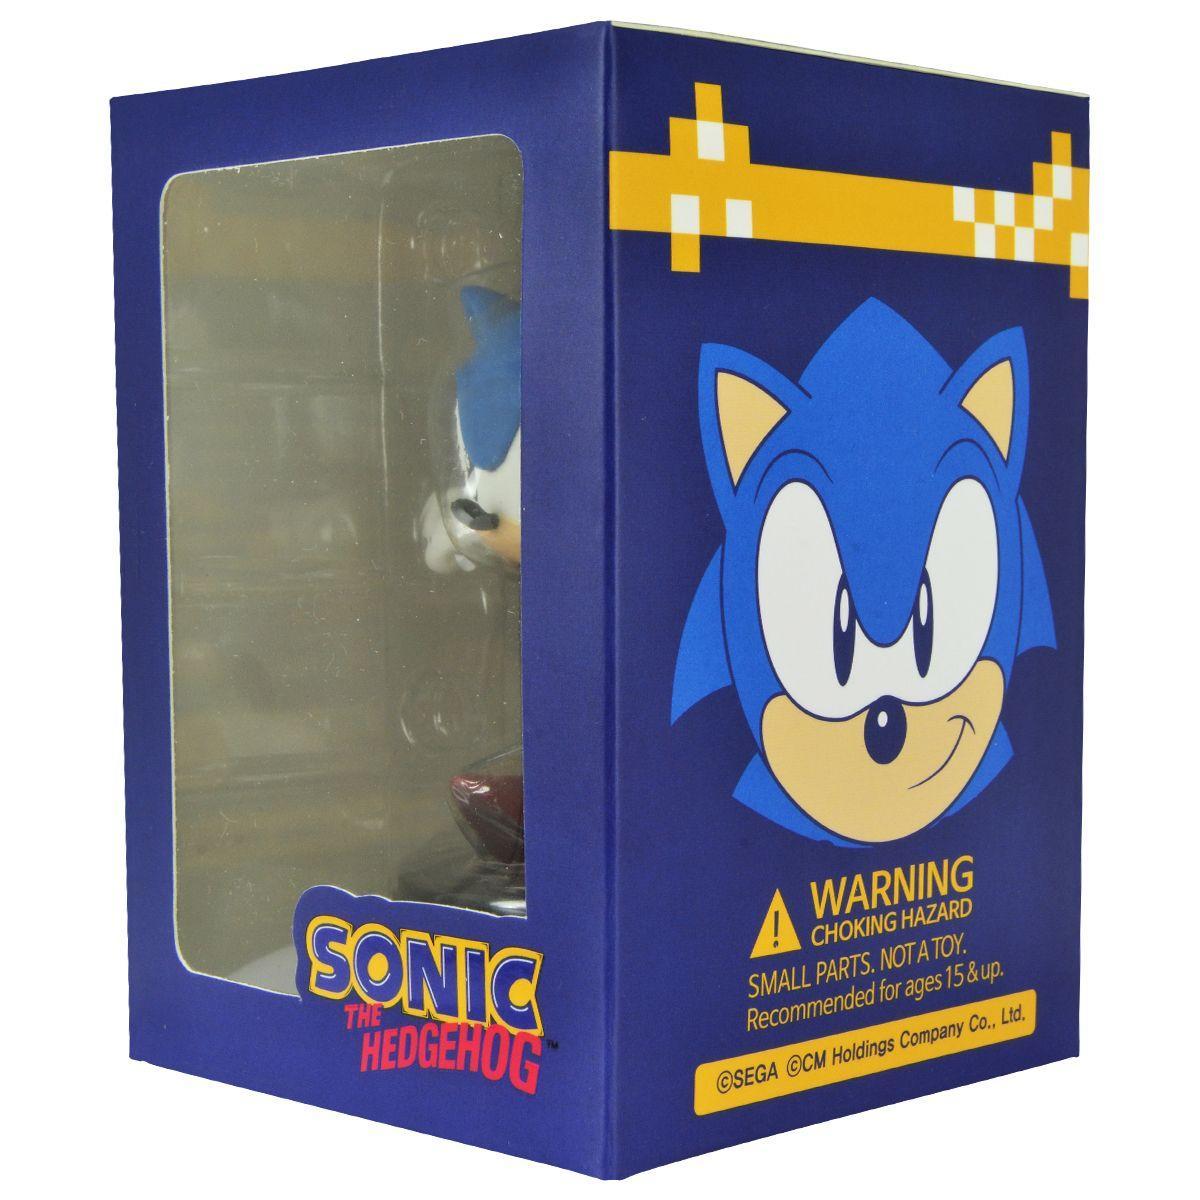 Фігурка Sonic The Hedgehog Vol.2 PVC (First 4 Figures, висота 8 см)